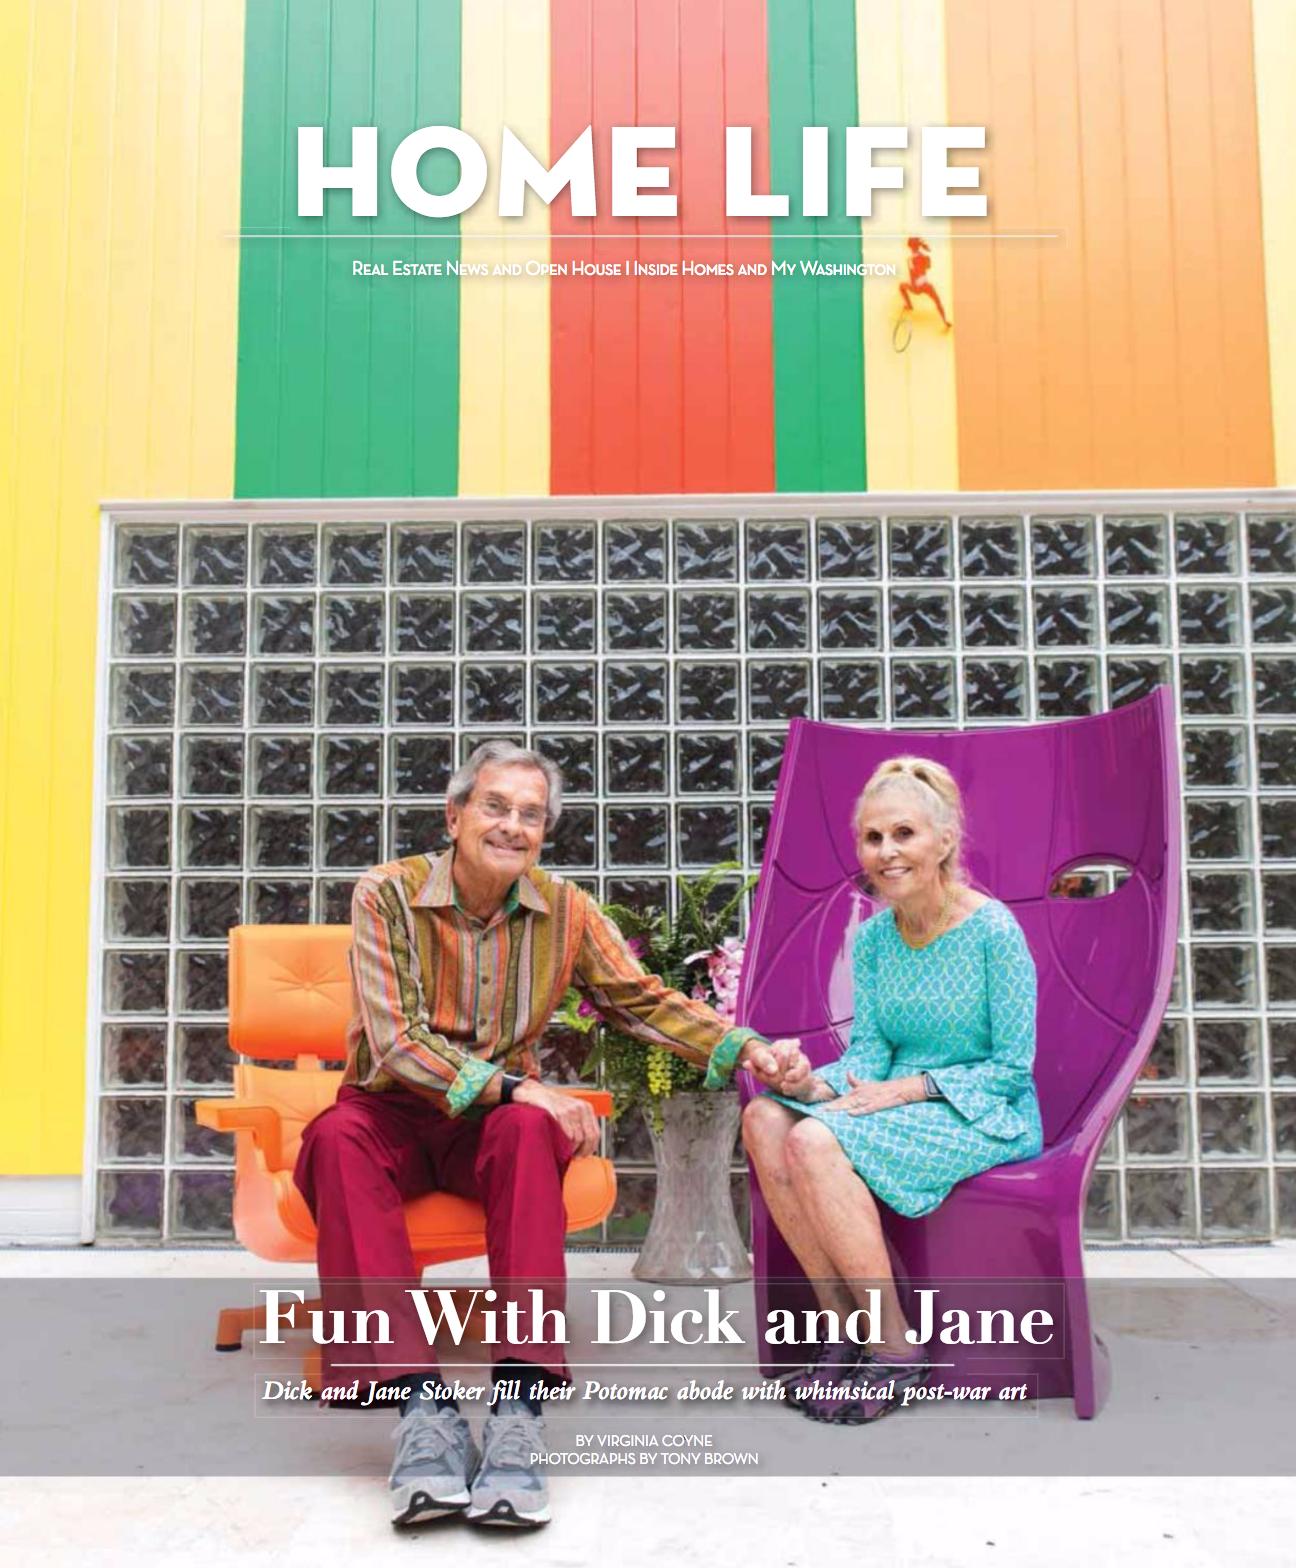 Inside Homes: Dick and Jane Stoker